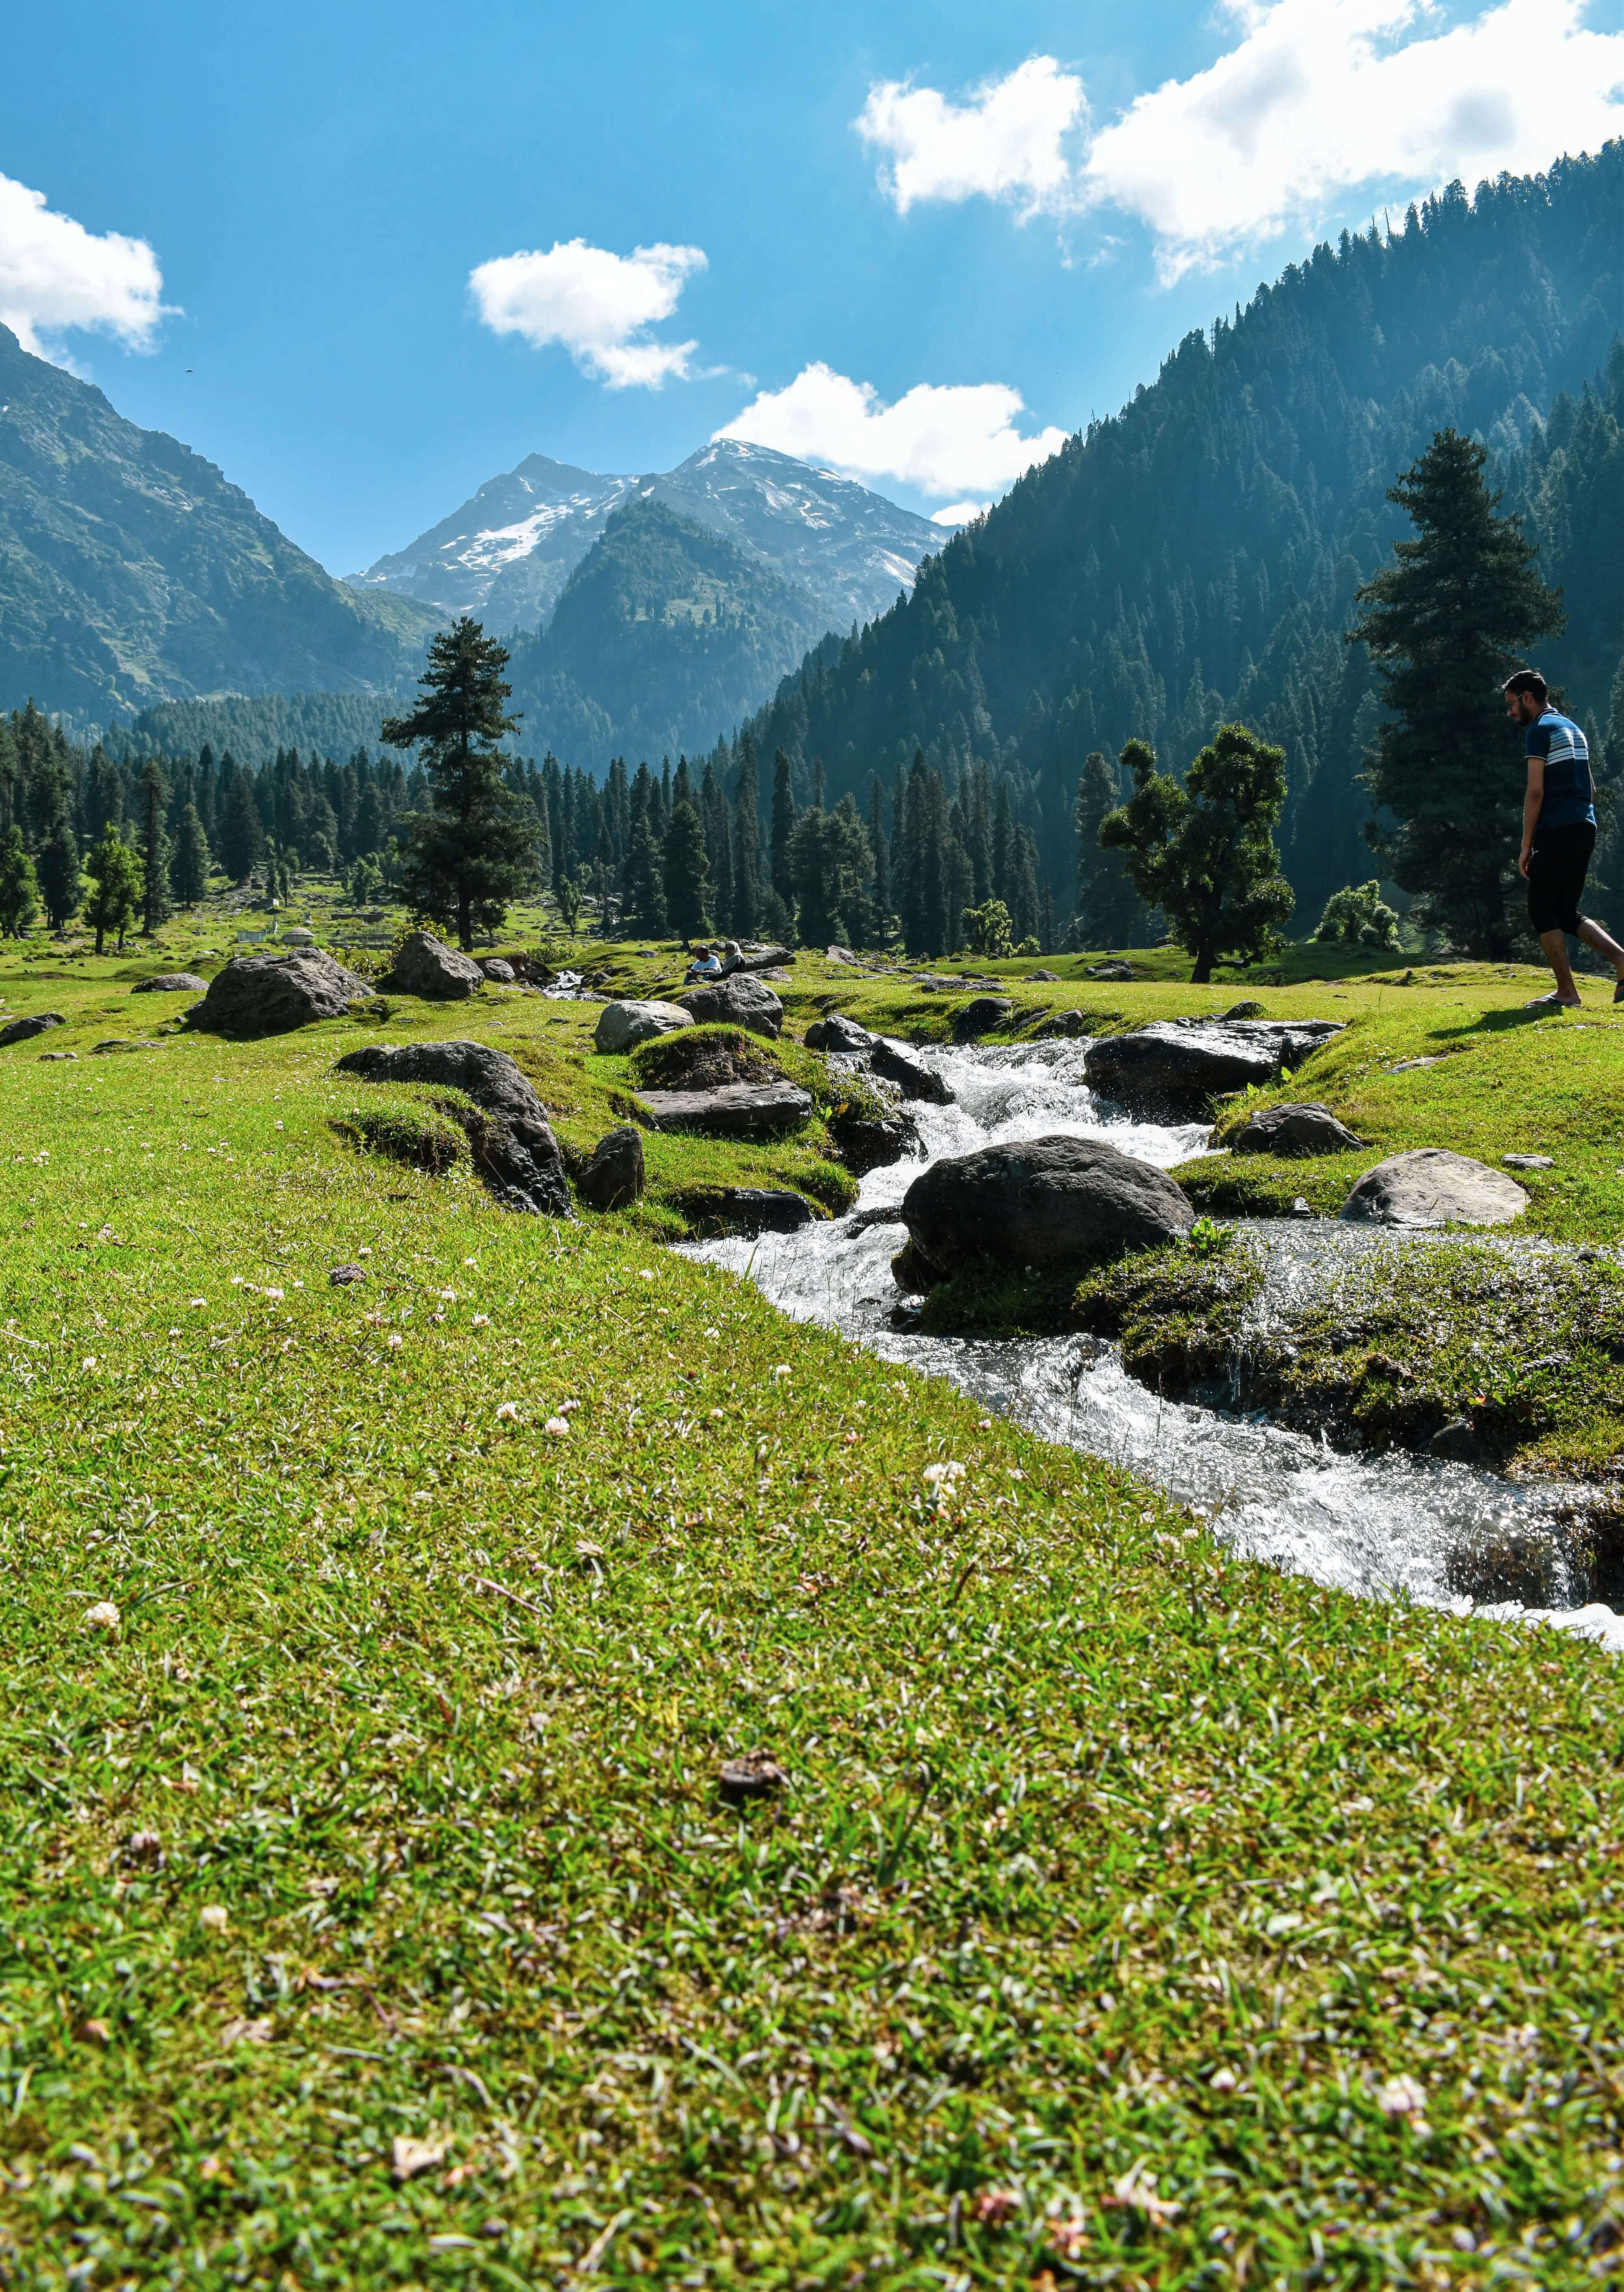 Trekking in Kashmir